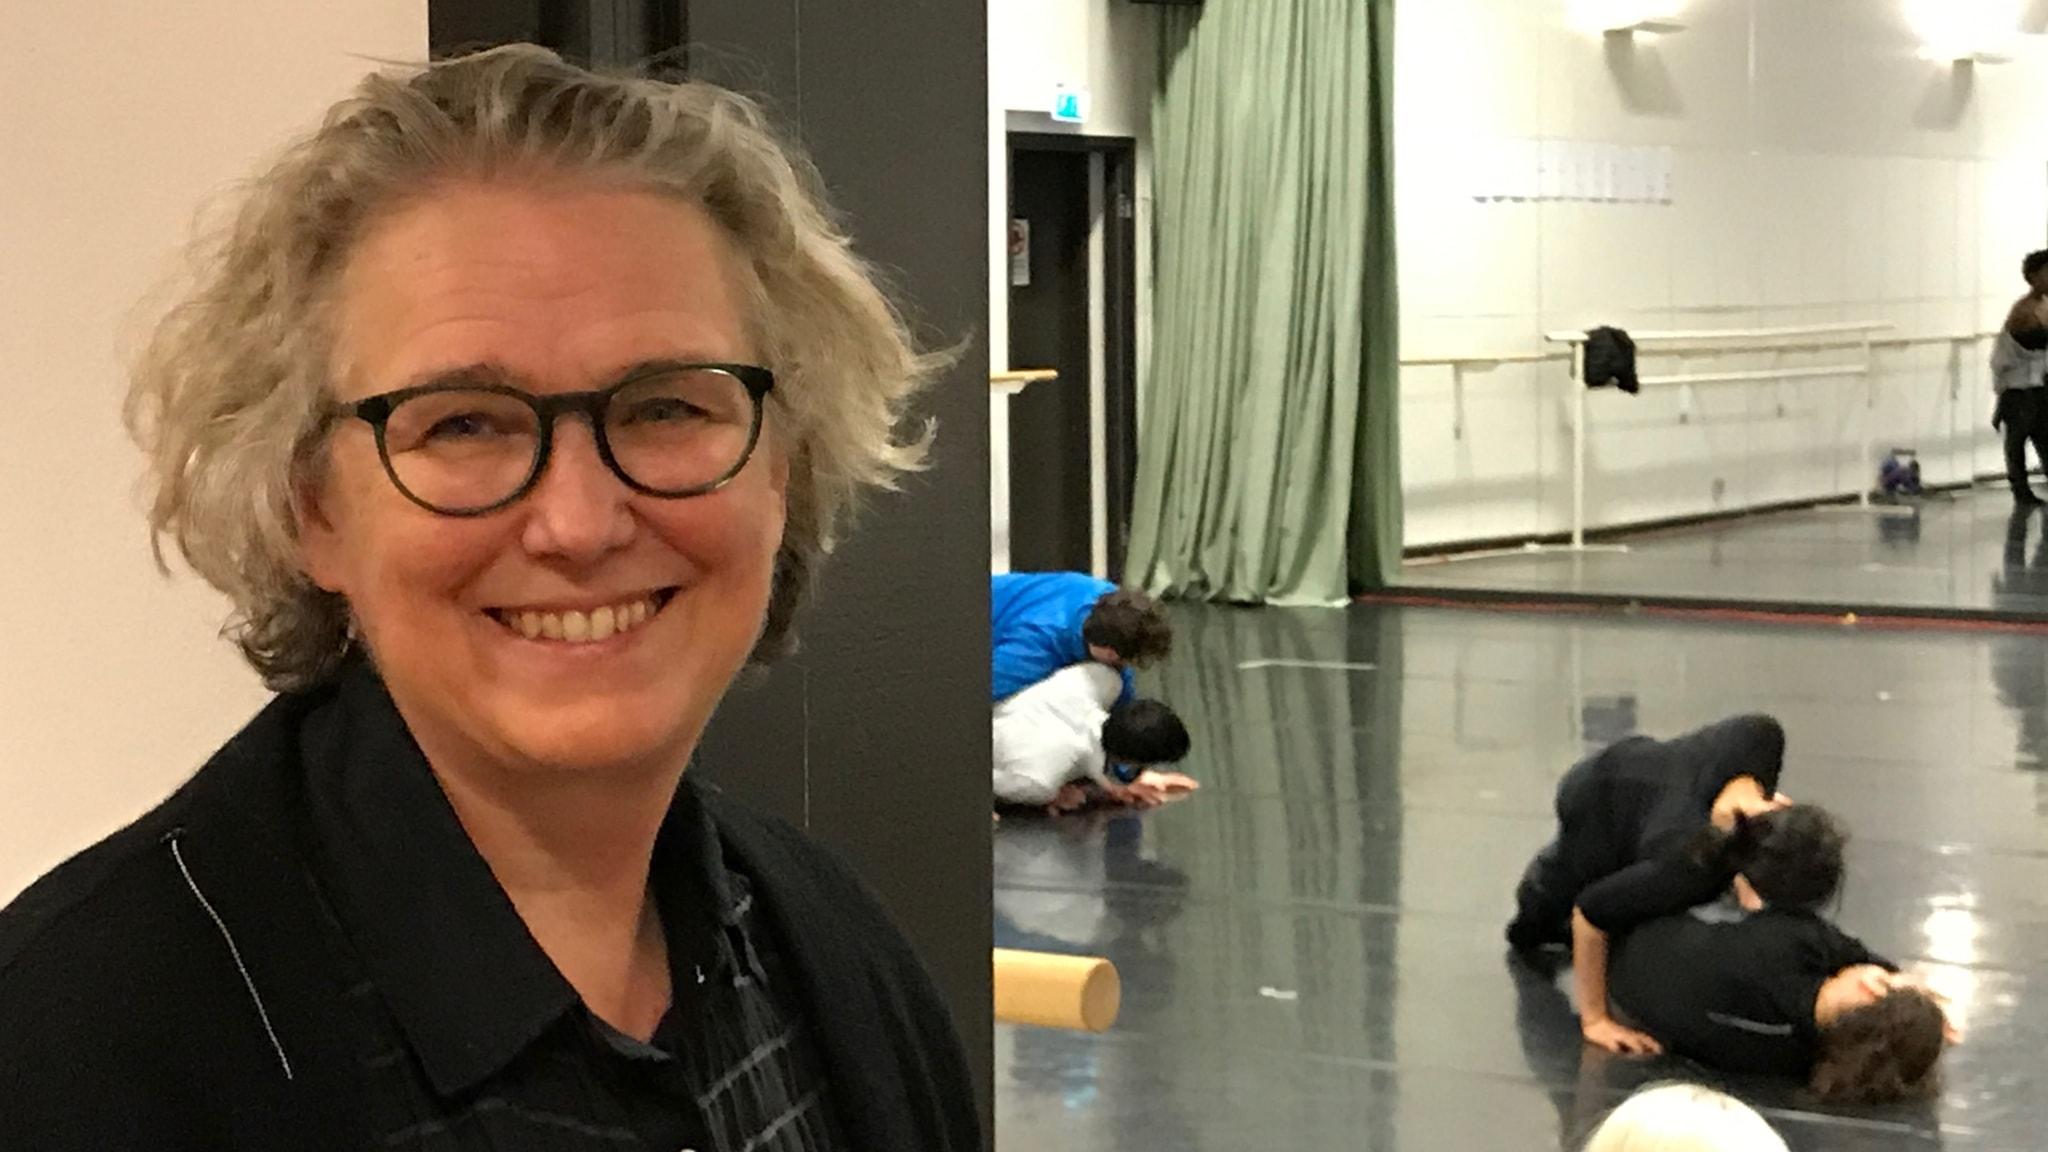 Åsa Söderberg